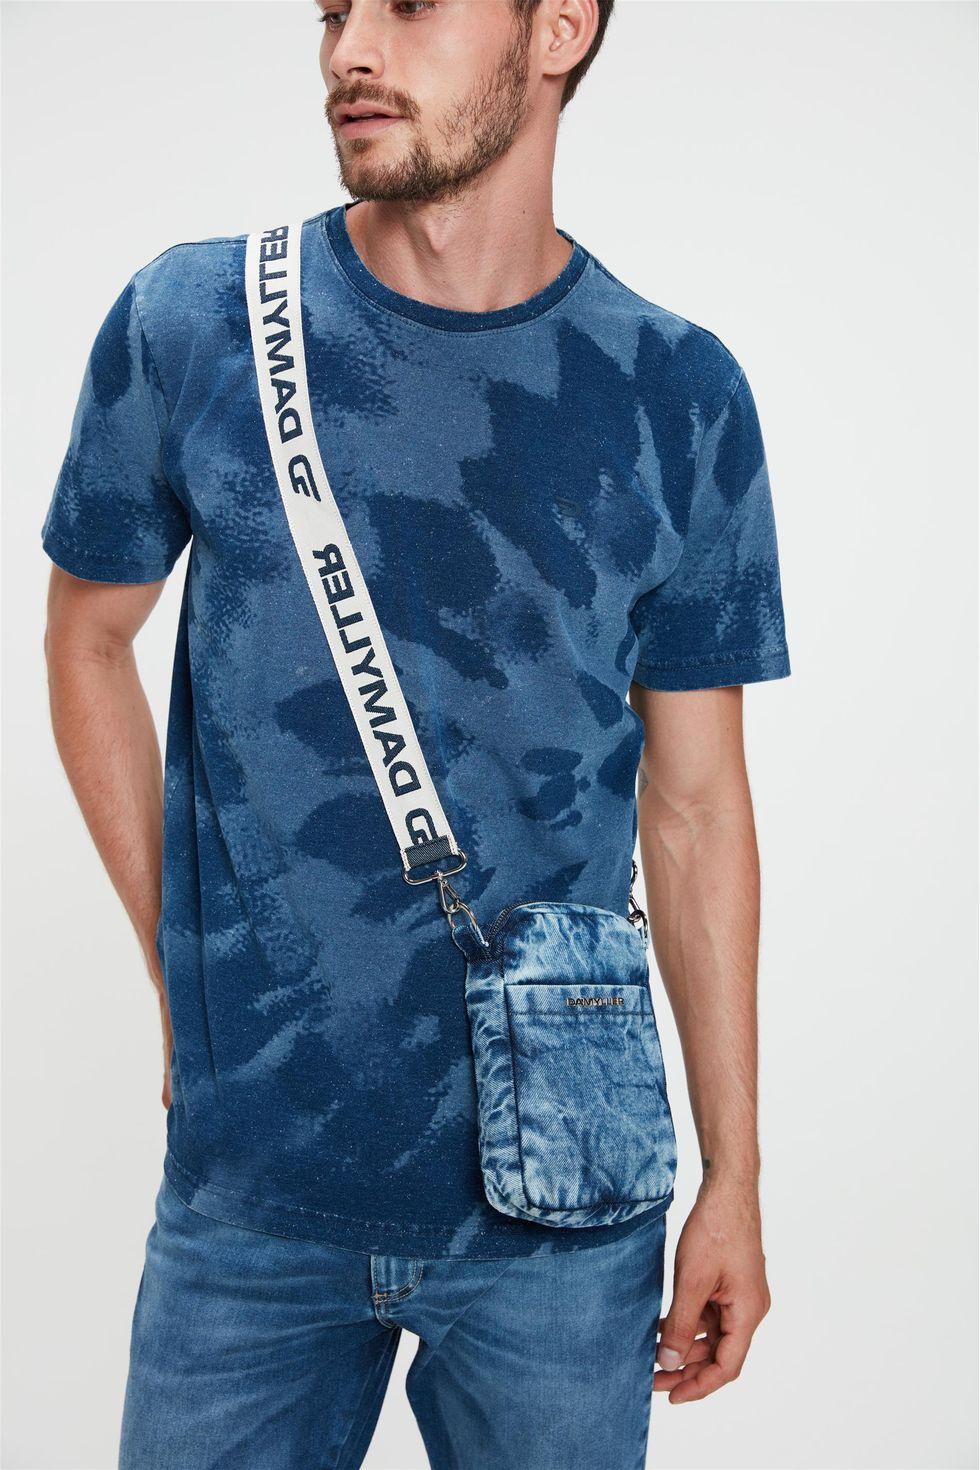 bolsa-mini-jeans-azul-claro-unissex-Frente--